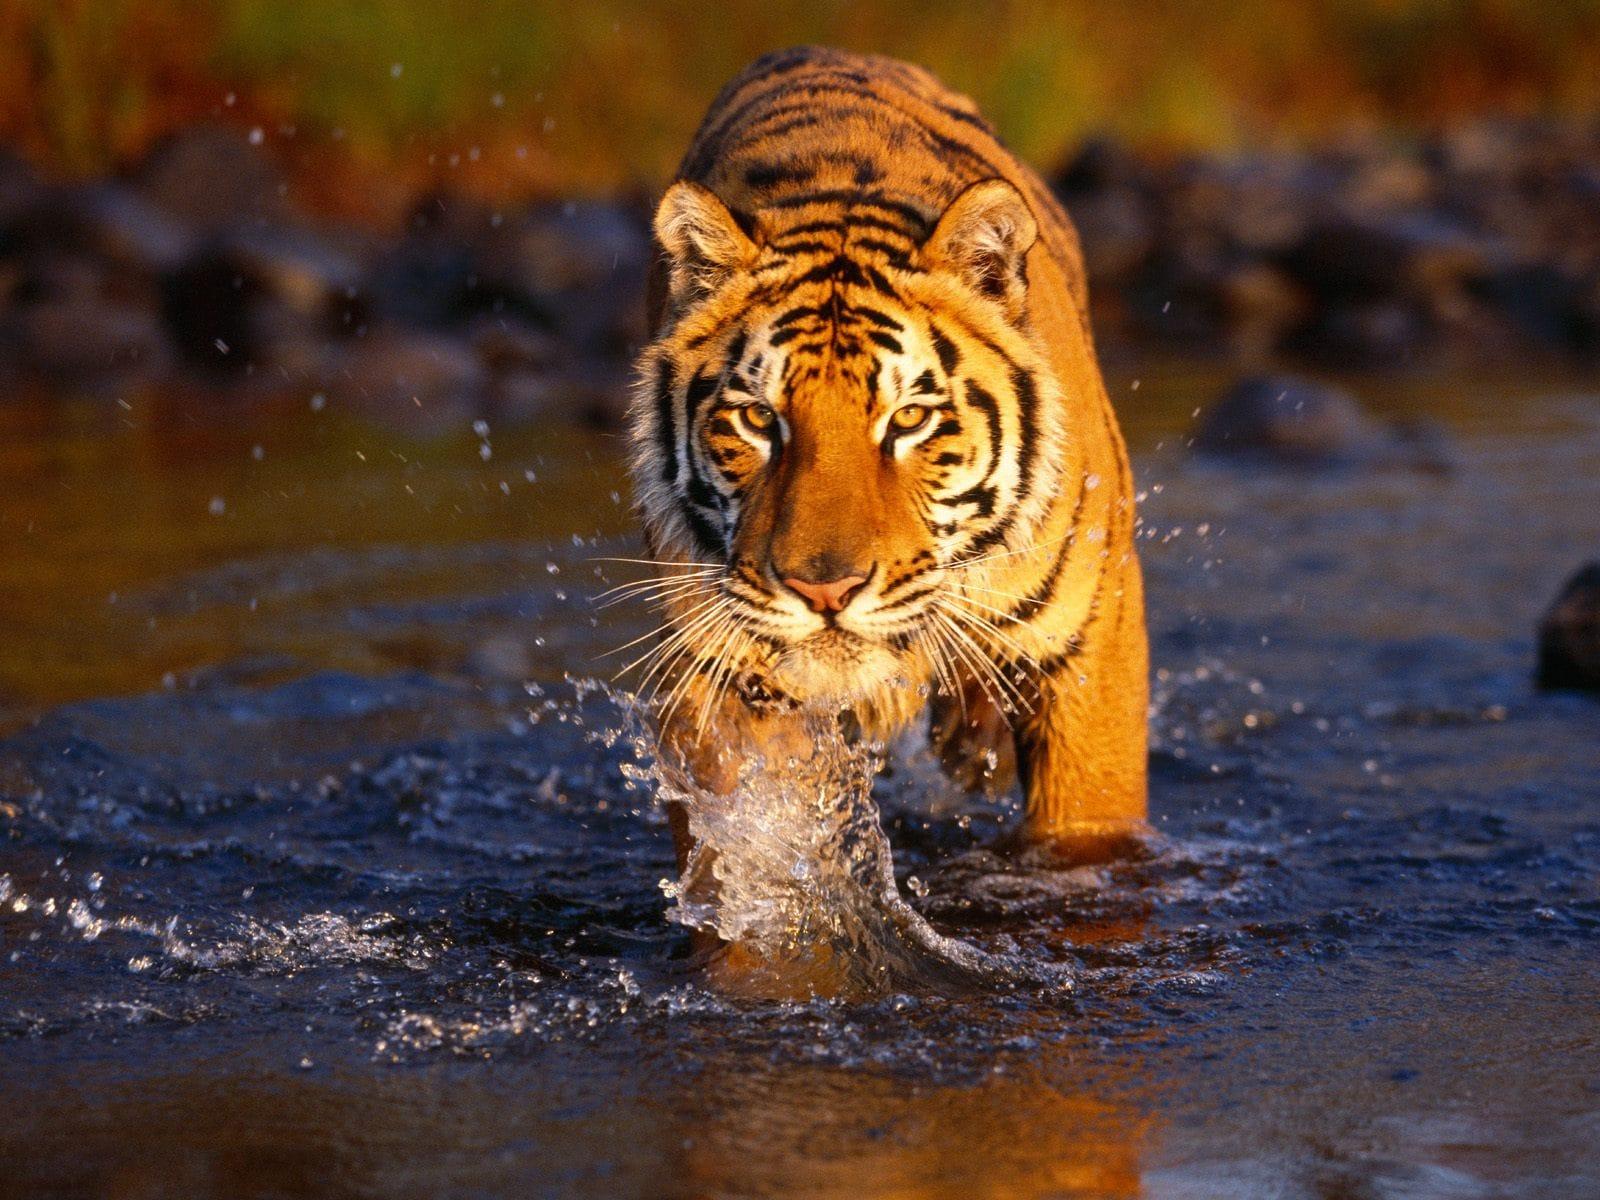 Tiger widescreen for desktop